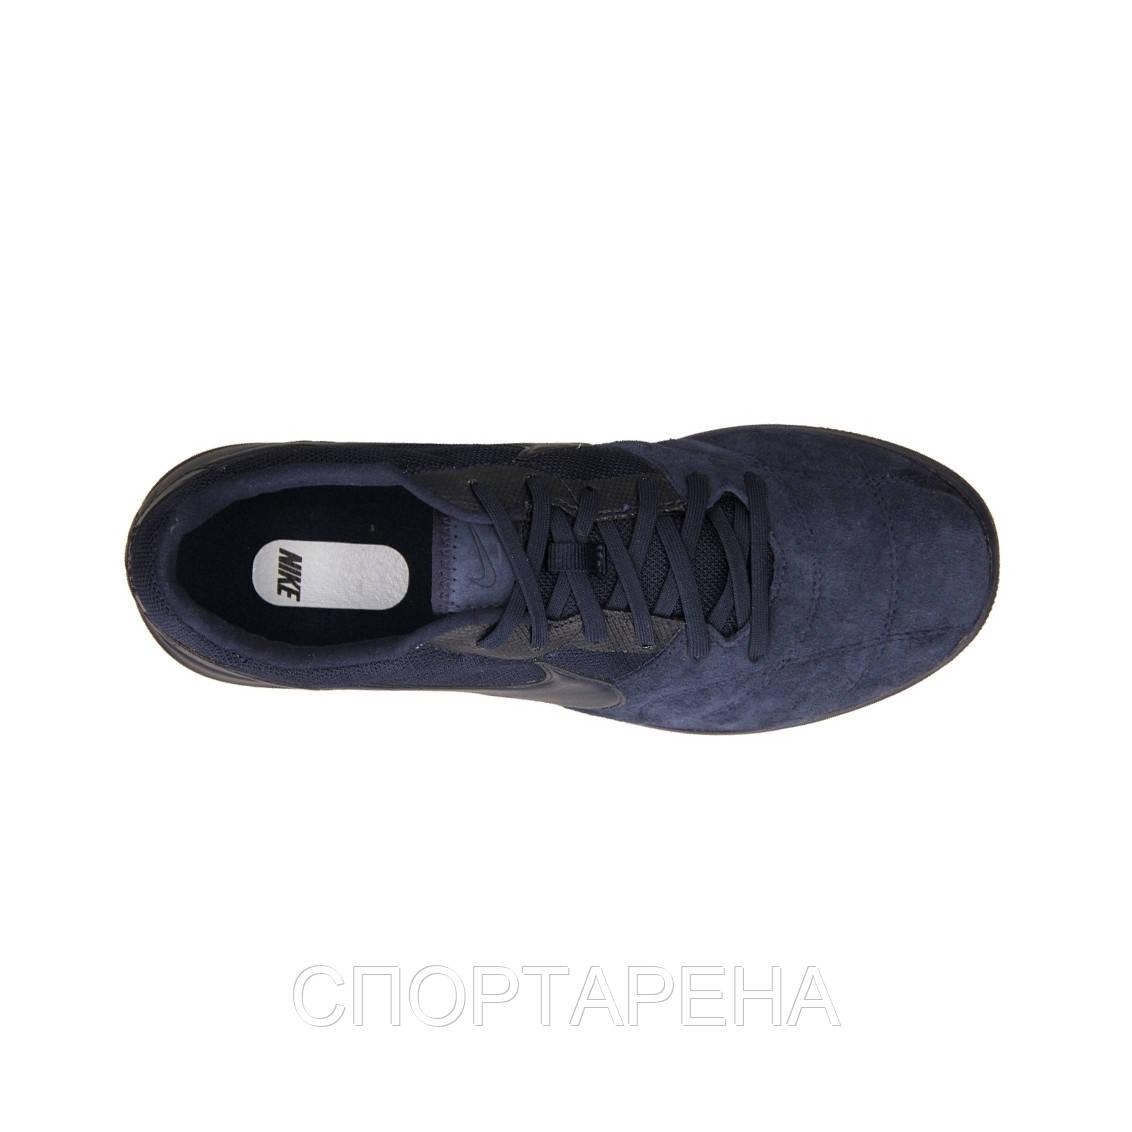 4e3df07e Футзалки Nike The Premier II Limited Sala AV3153-441: продажа, цена ...